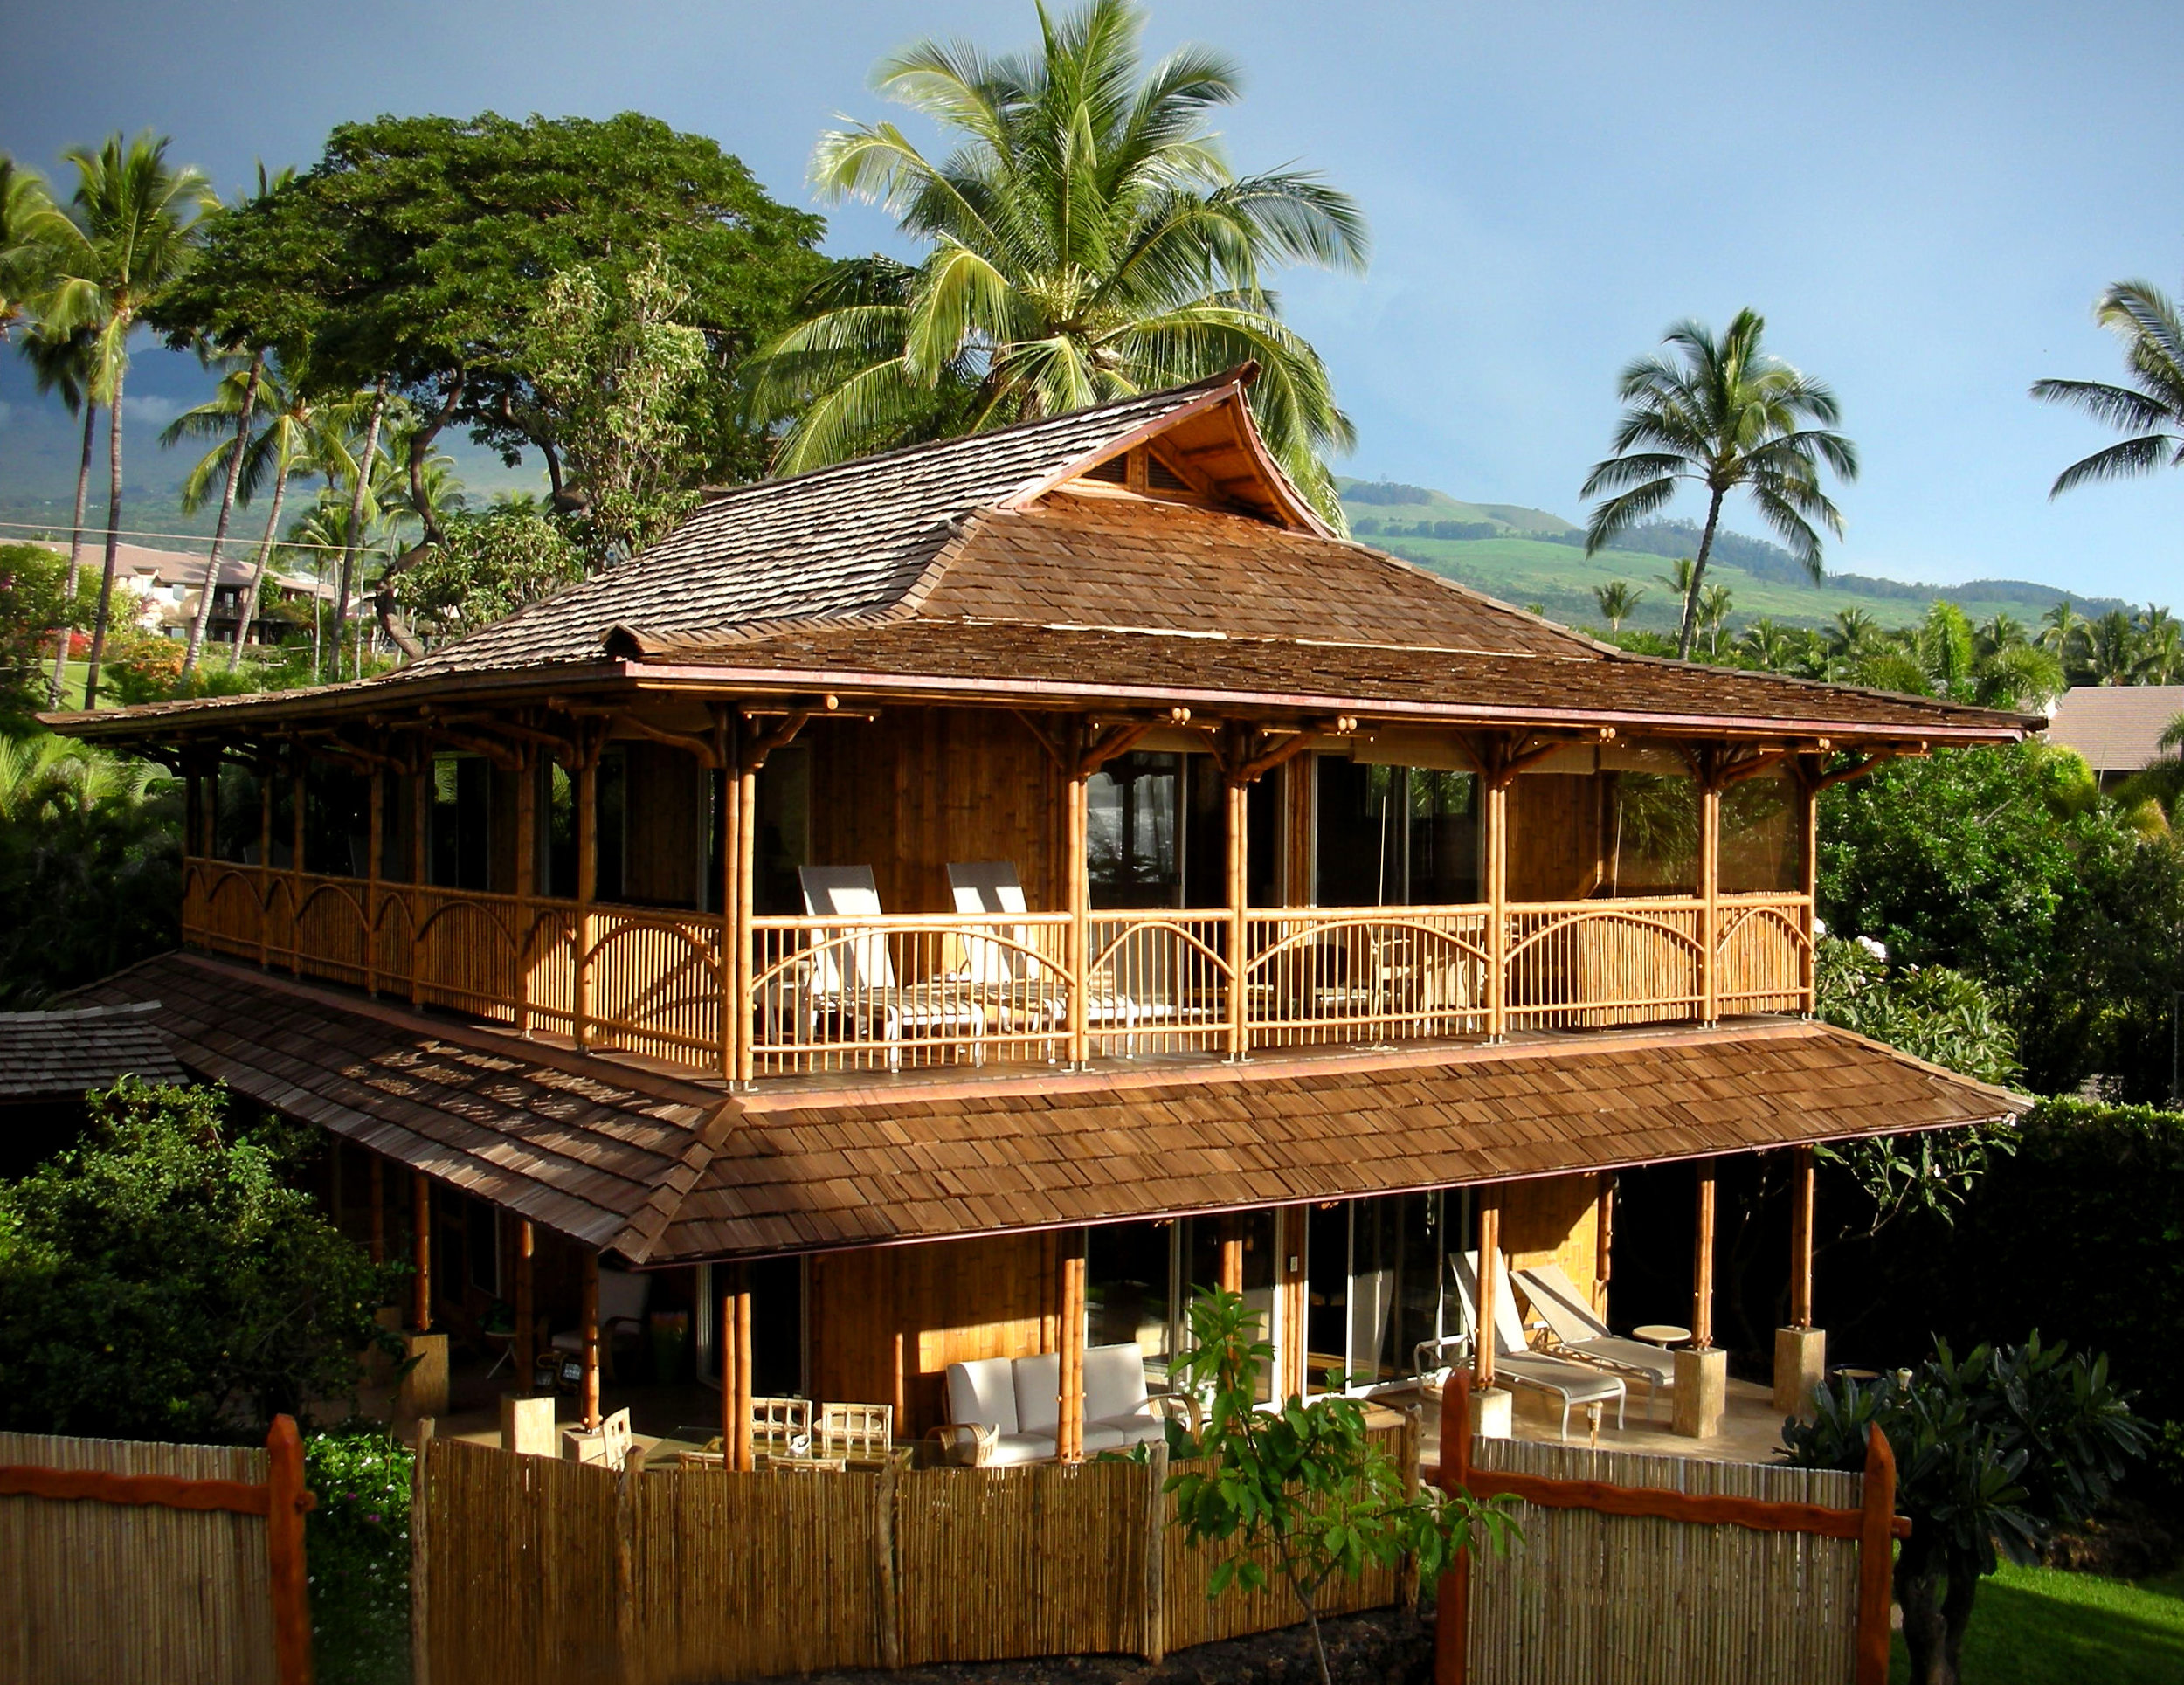 BL Home - Bali 2 story.jpg